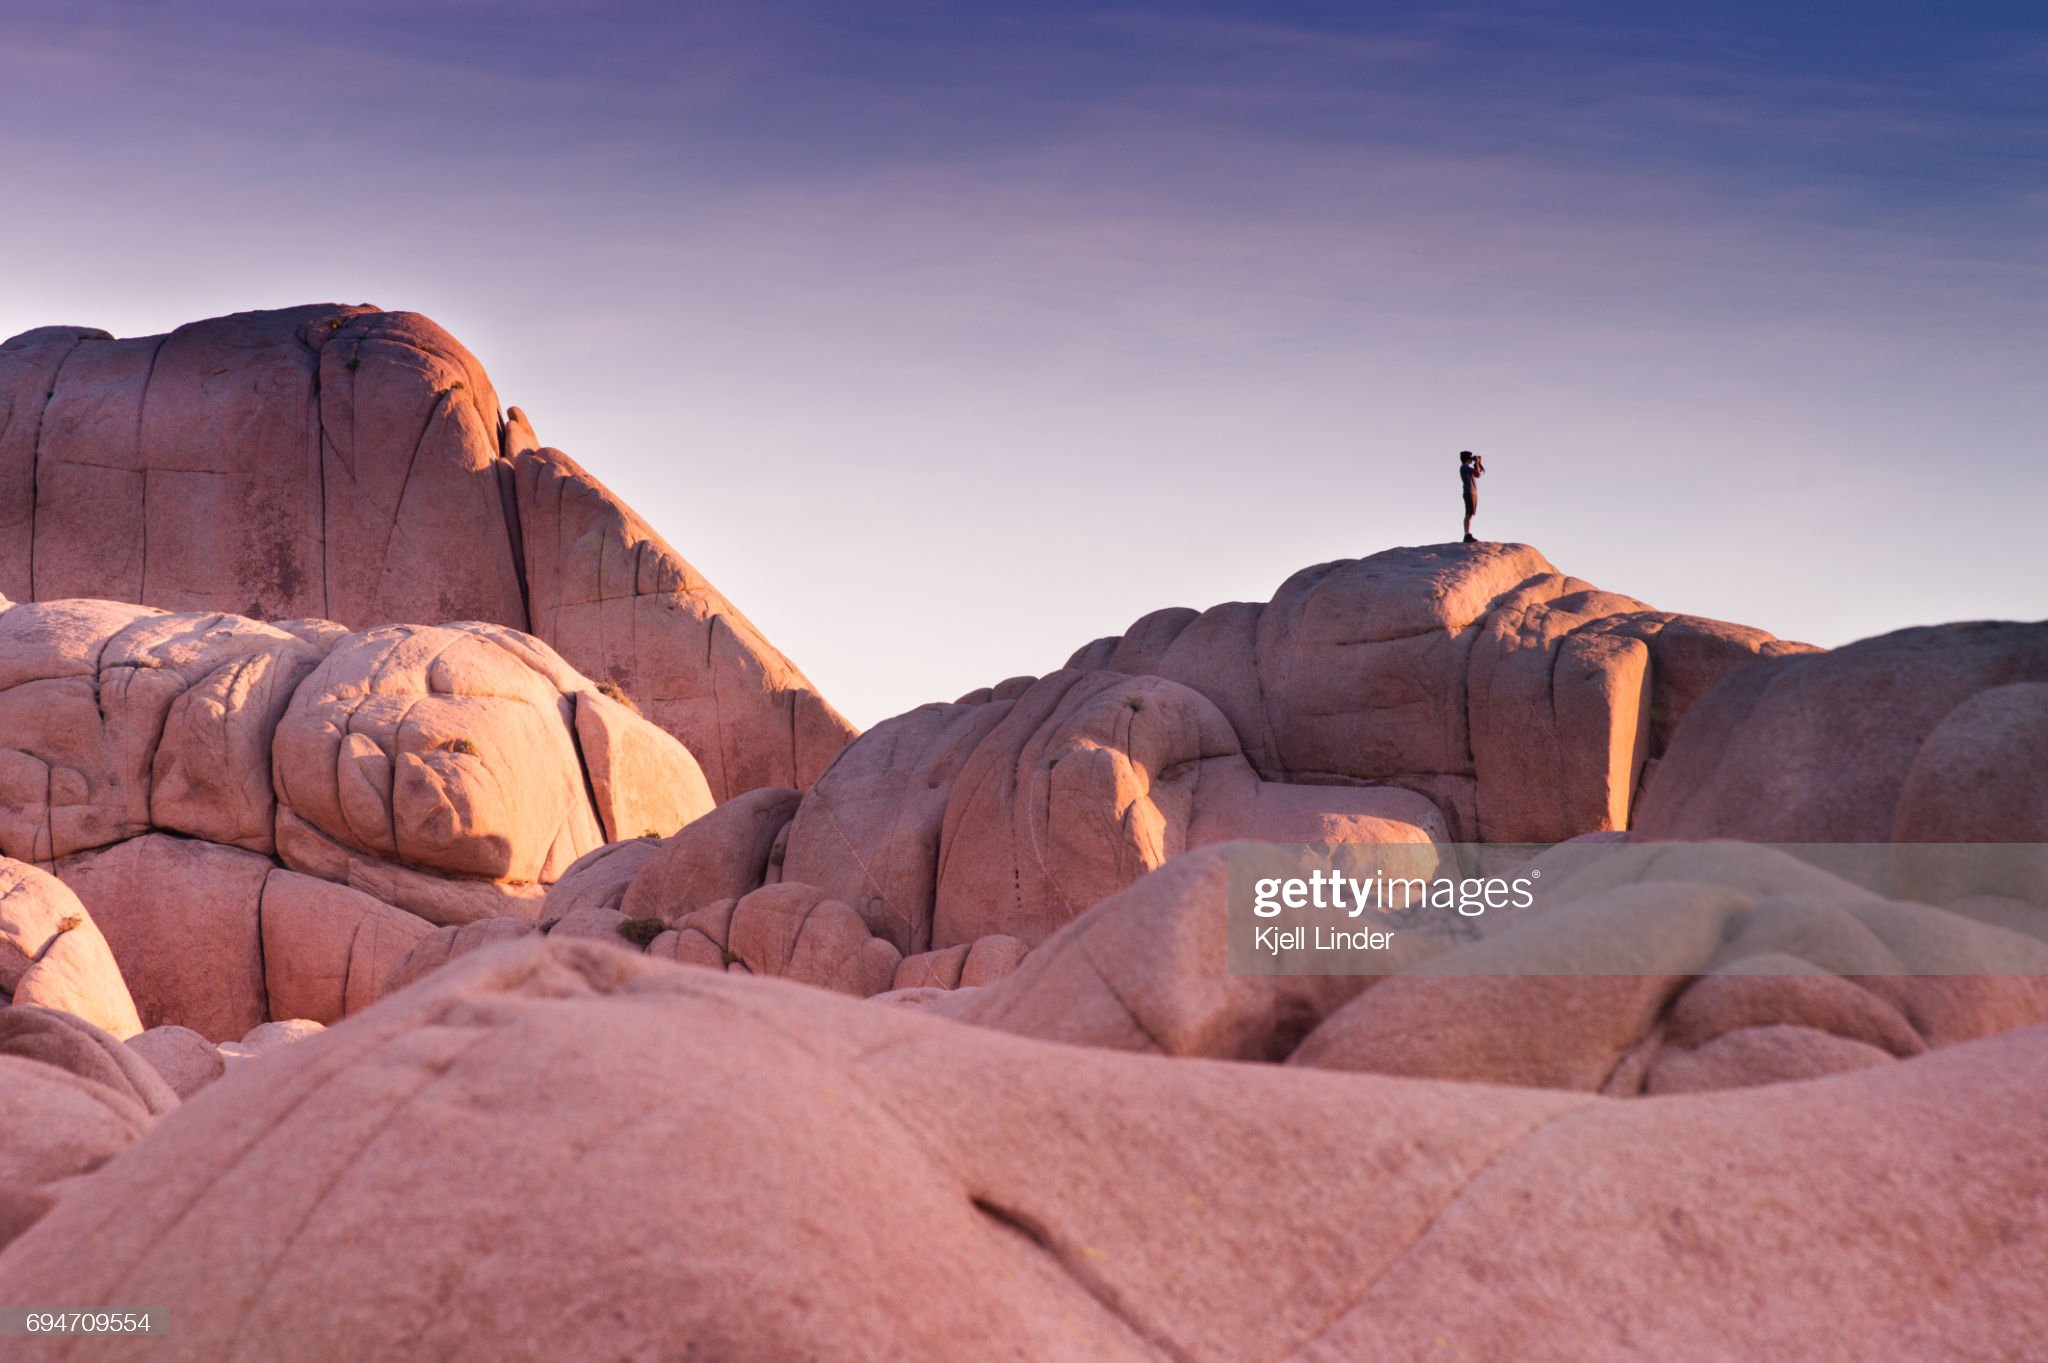 Man overlooks Joshua Tree boulders during sunset : 圖庫照片